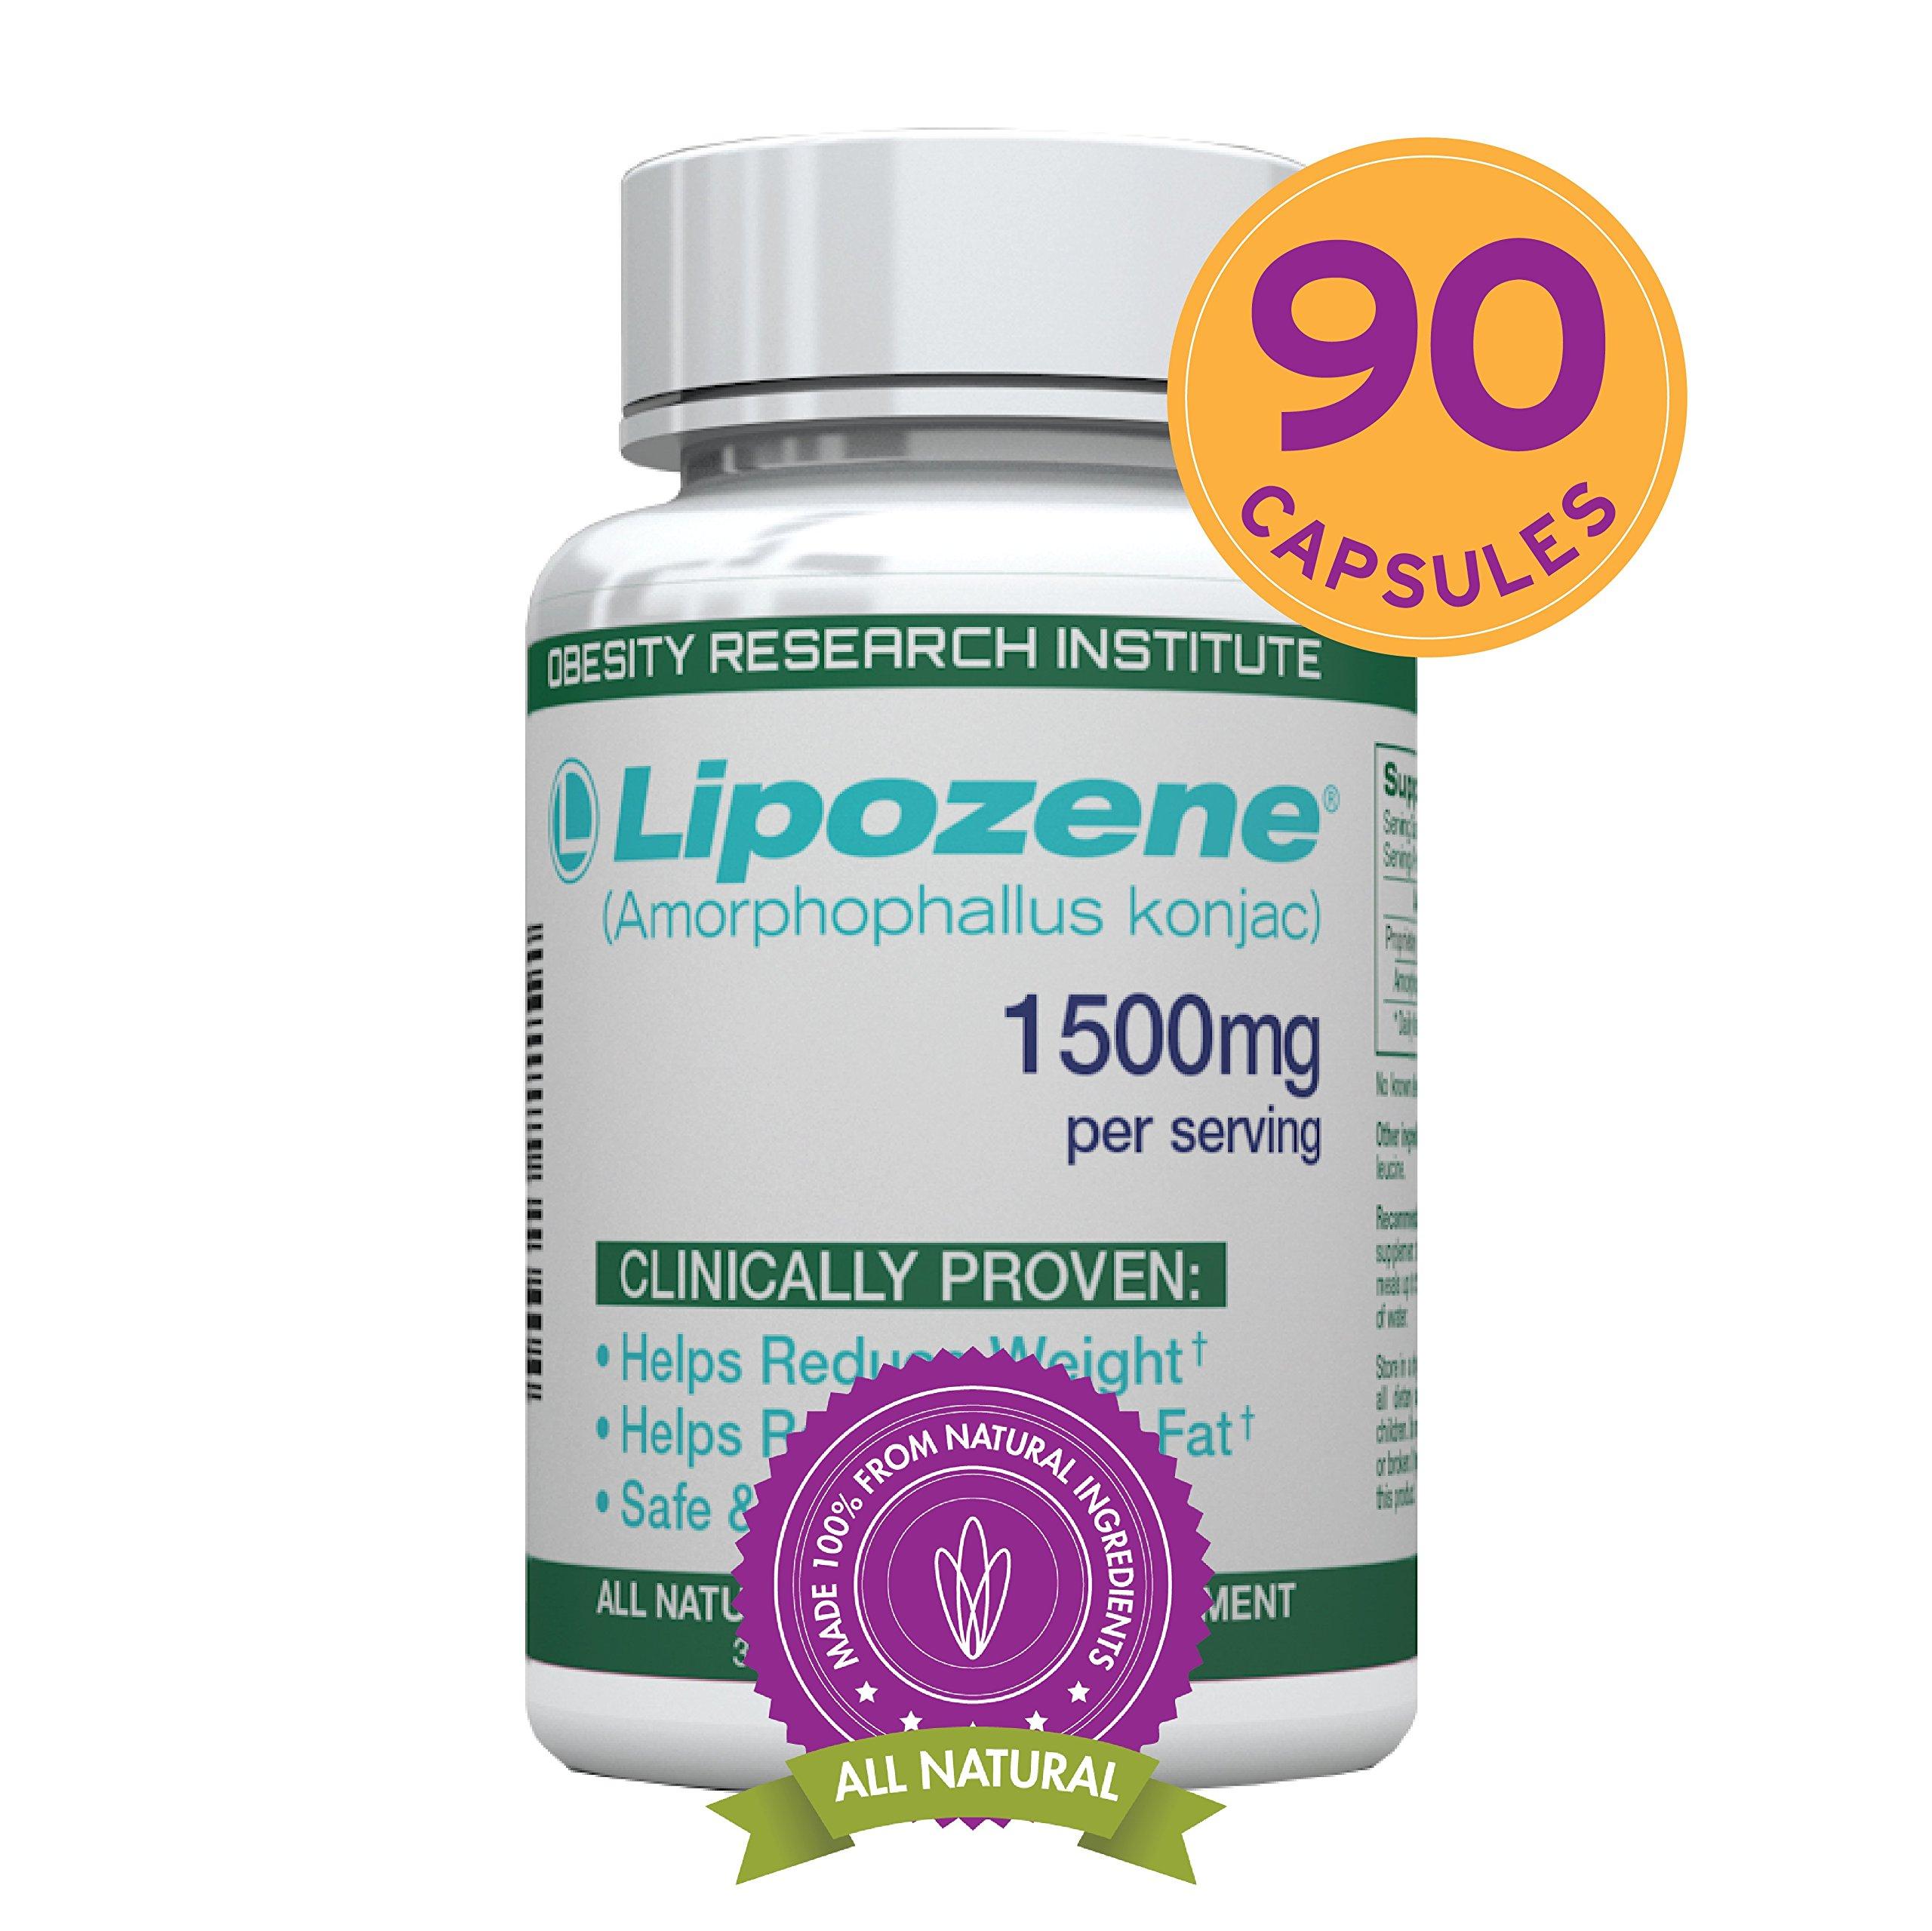 Lipozene Green Diet Pills -90 Veggie Capsules, All Natural Weight Loss Supplement - Appetite Suppressant and Control - - No Stimulants, No Jitters